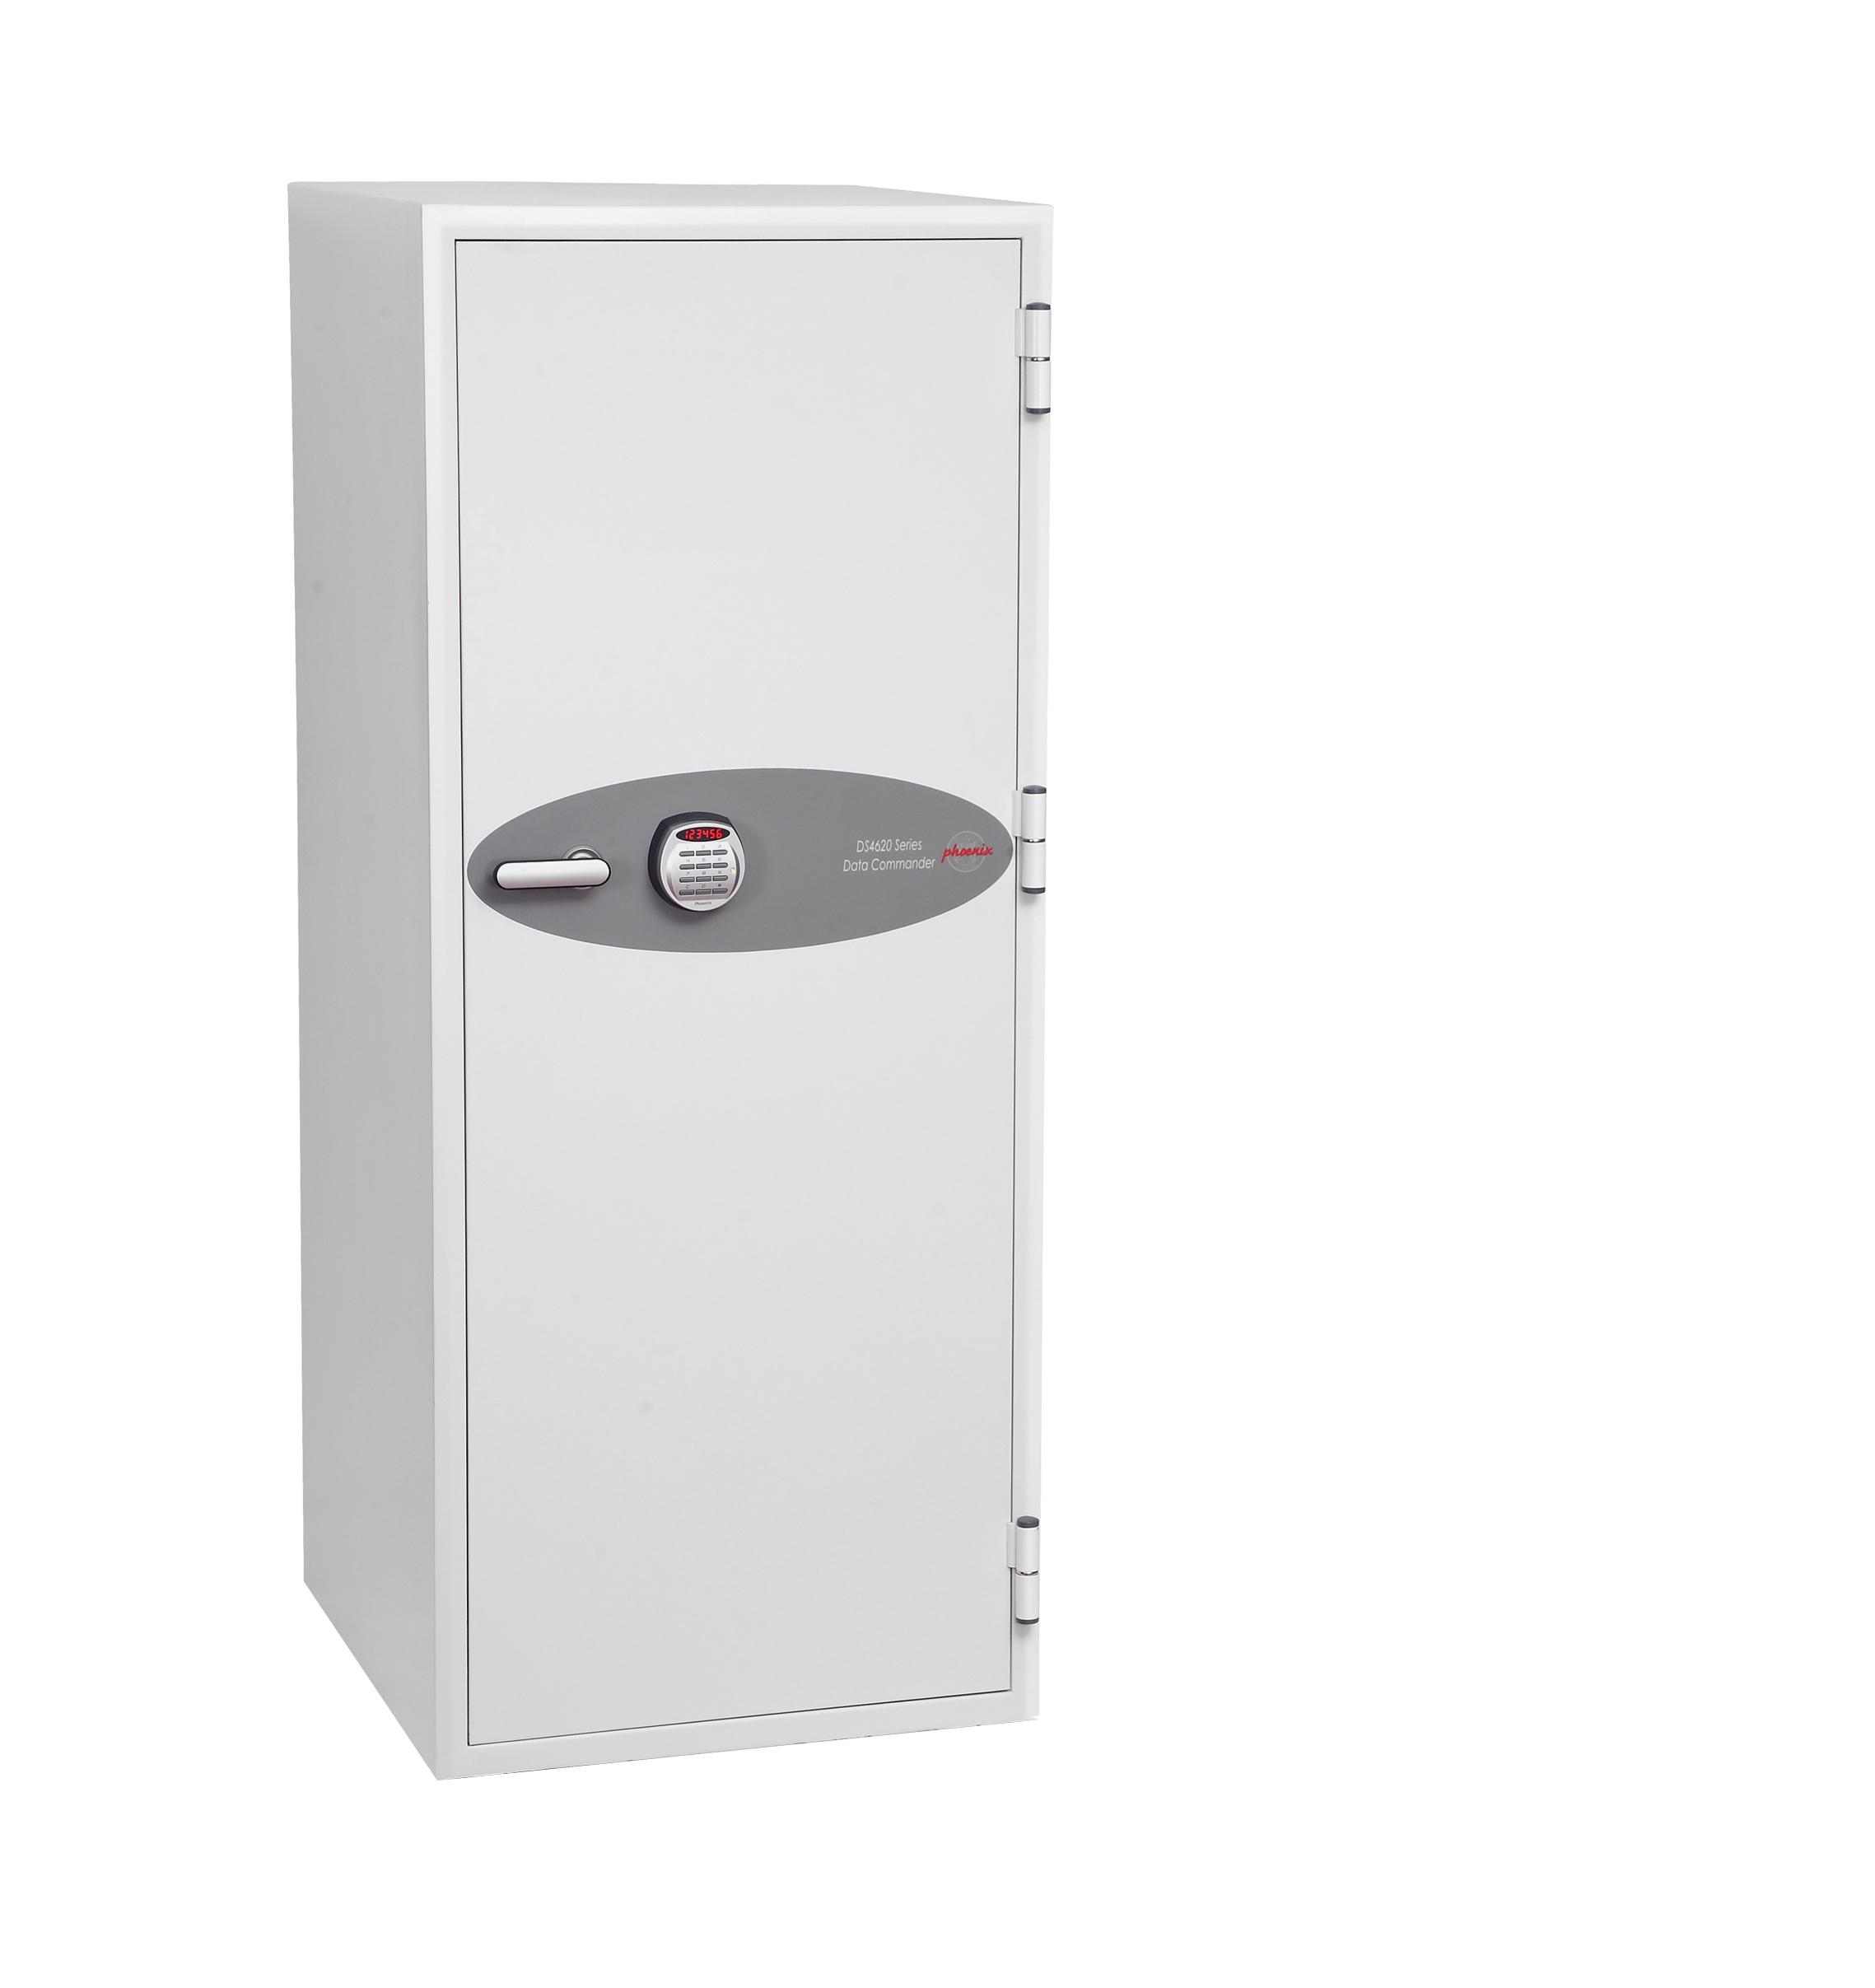 Phoenix Data Commander Size 2 Data Safe Electronic Lock White DS4622E